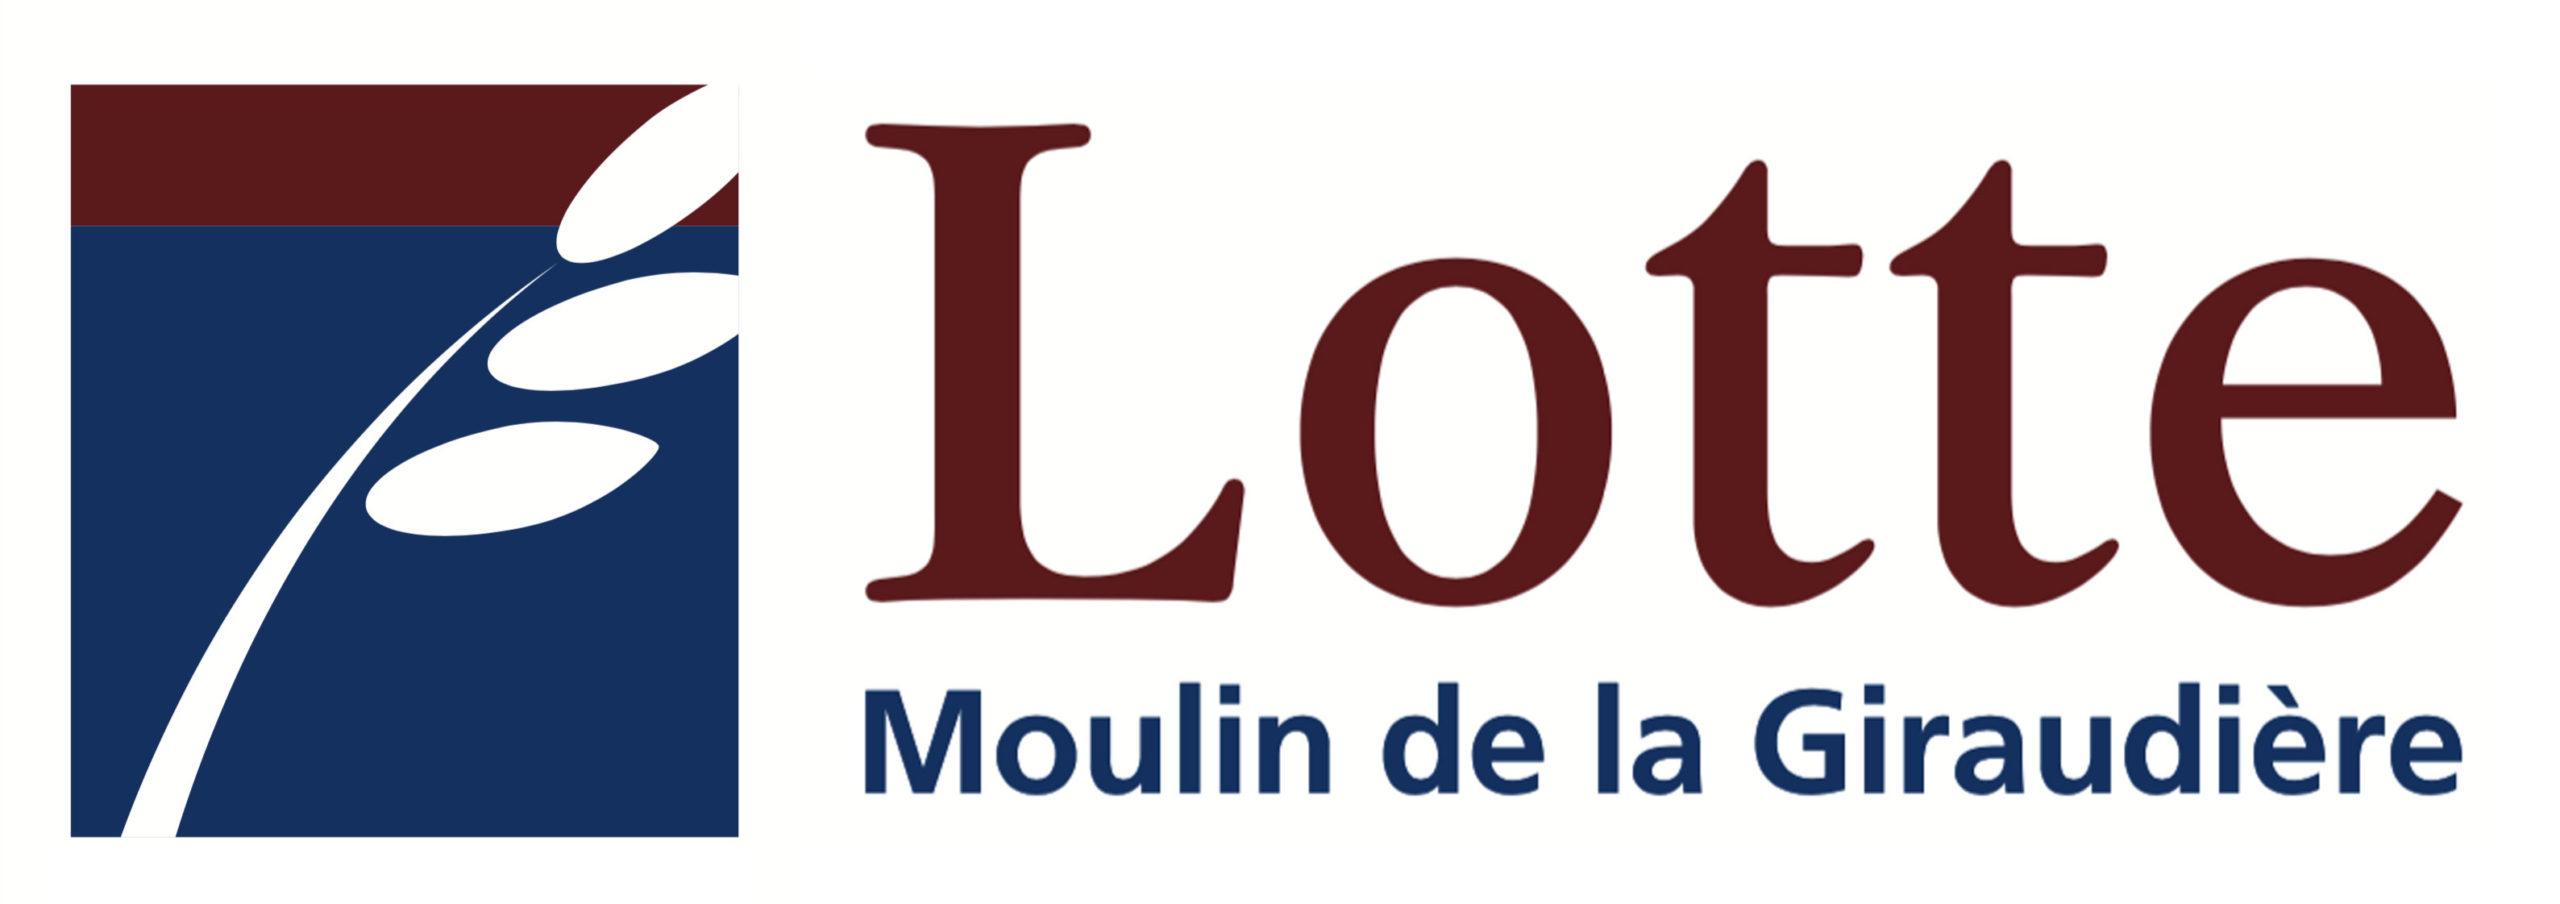 Moulin de la Giraudière